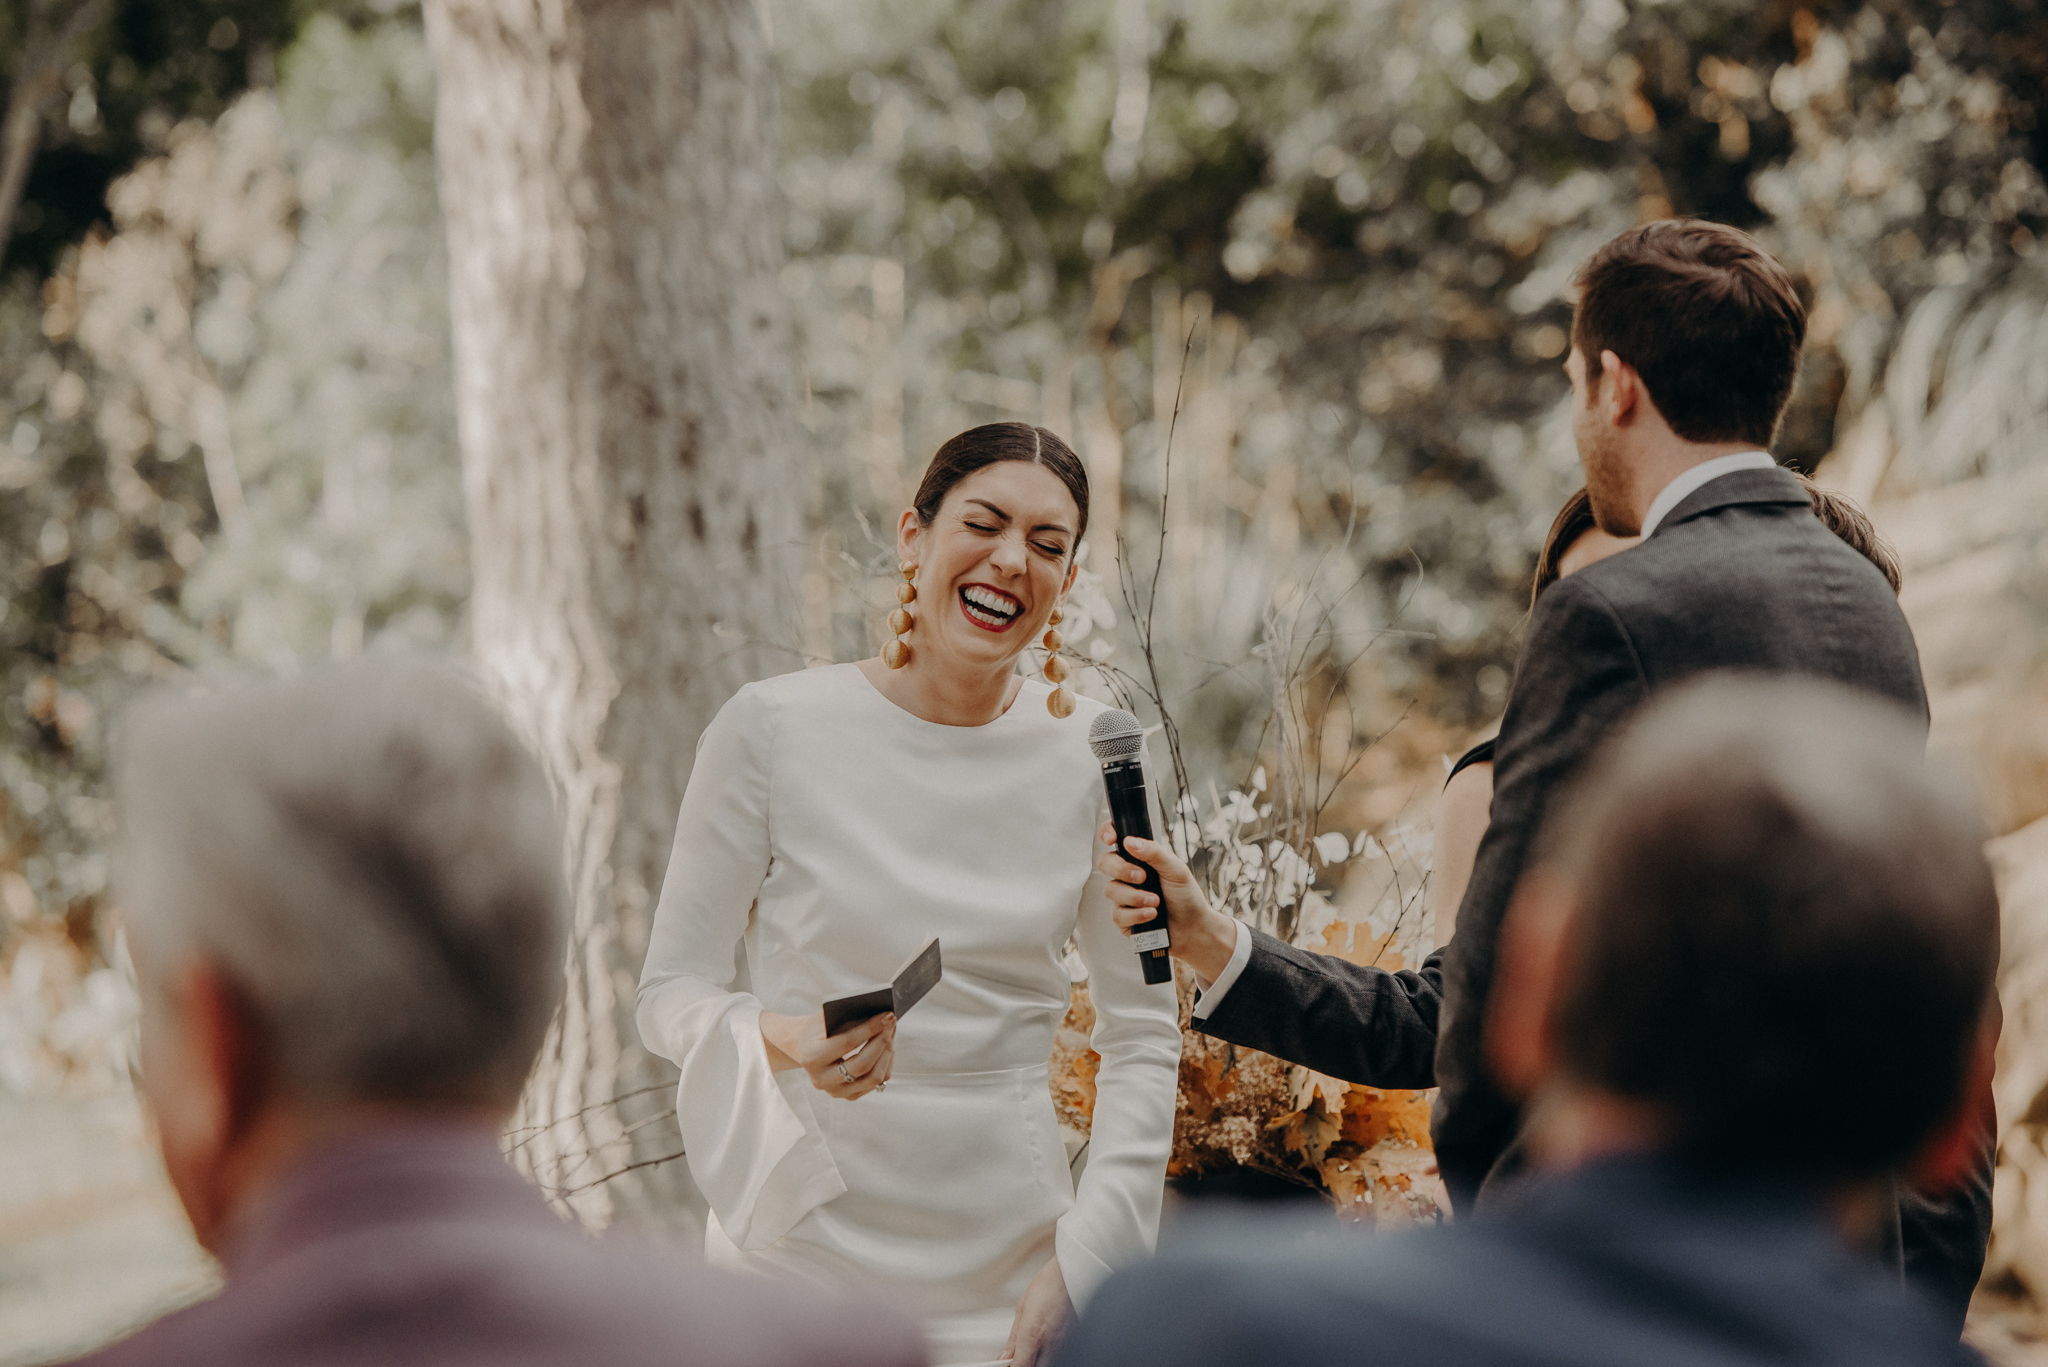 Hummingbird Nest Ranch Wedding - Wedding Photographer in Los Angeles - IsaiahAndTaylor.com-042.jpg